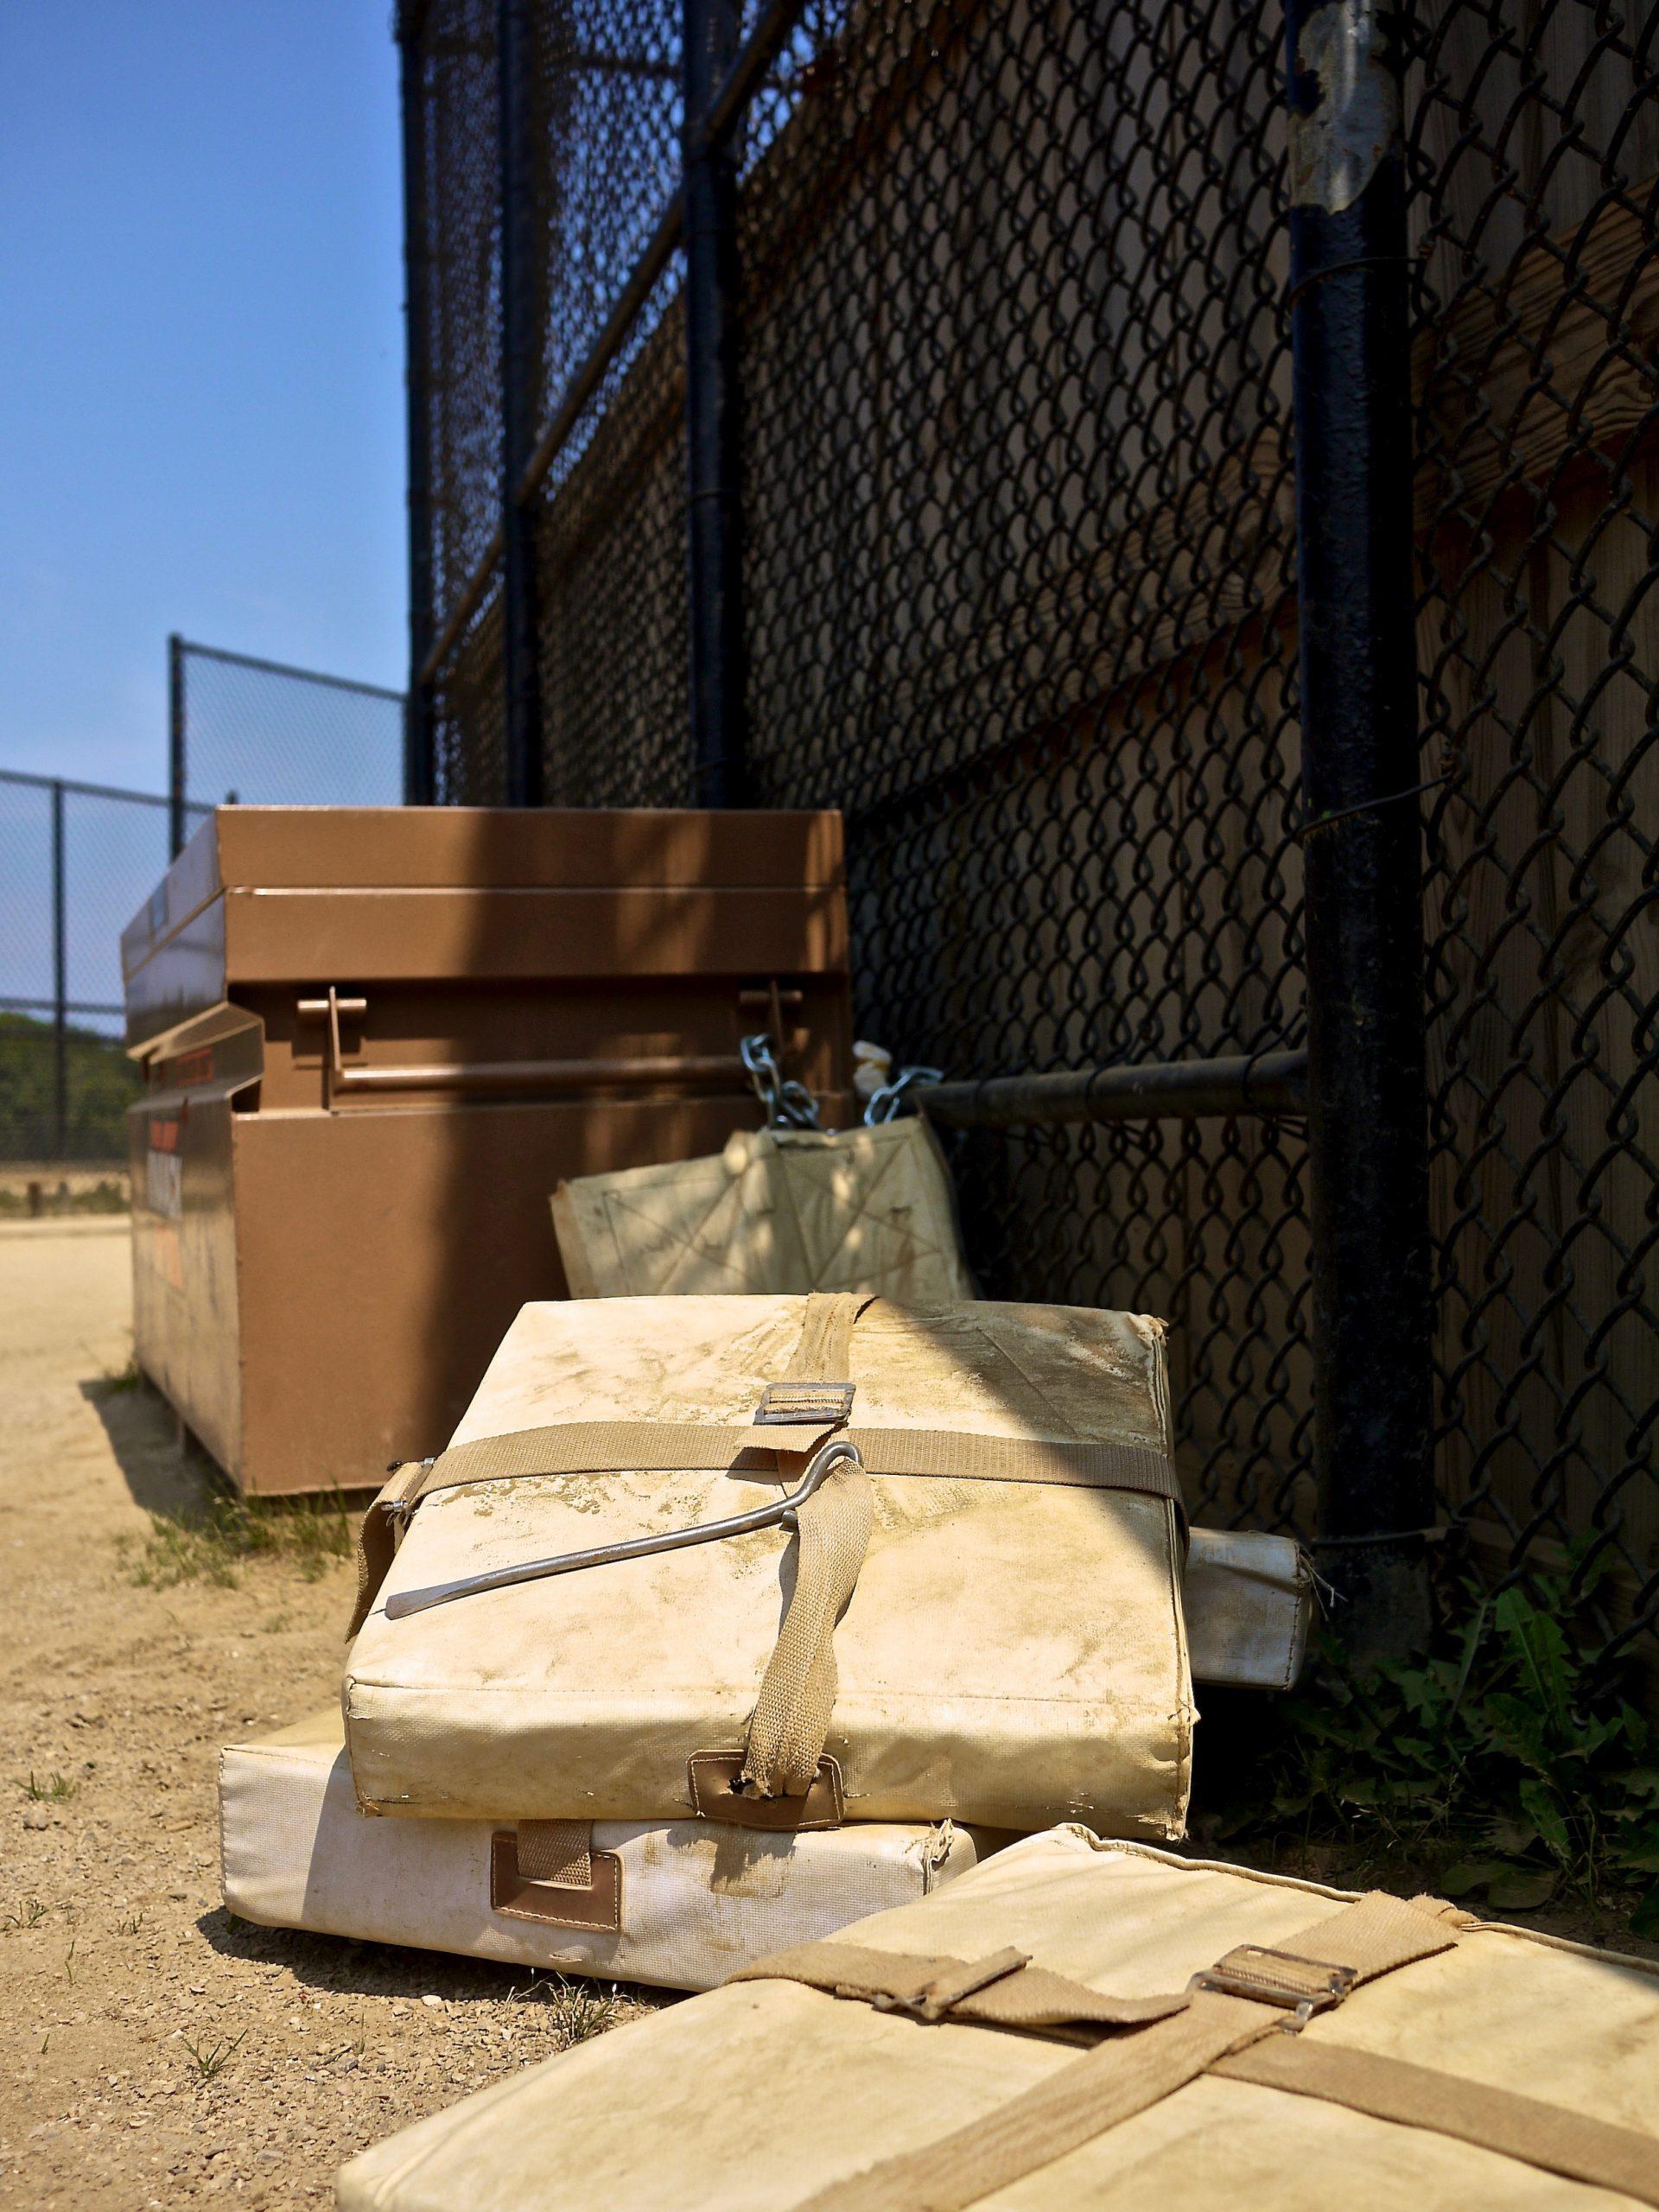 A pile of baseball bases sitting outside of a storage bin.